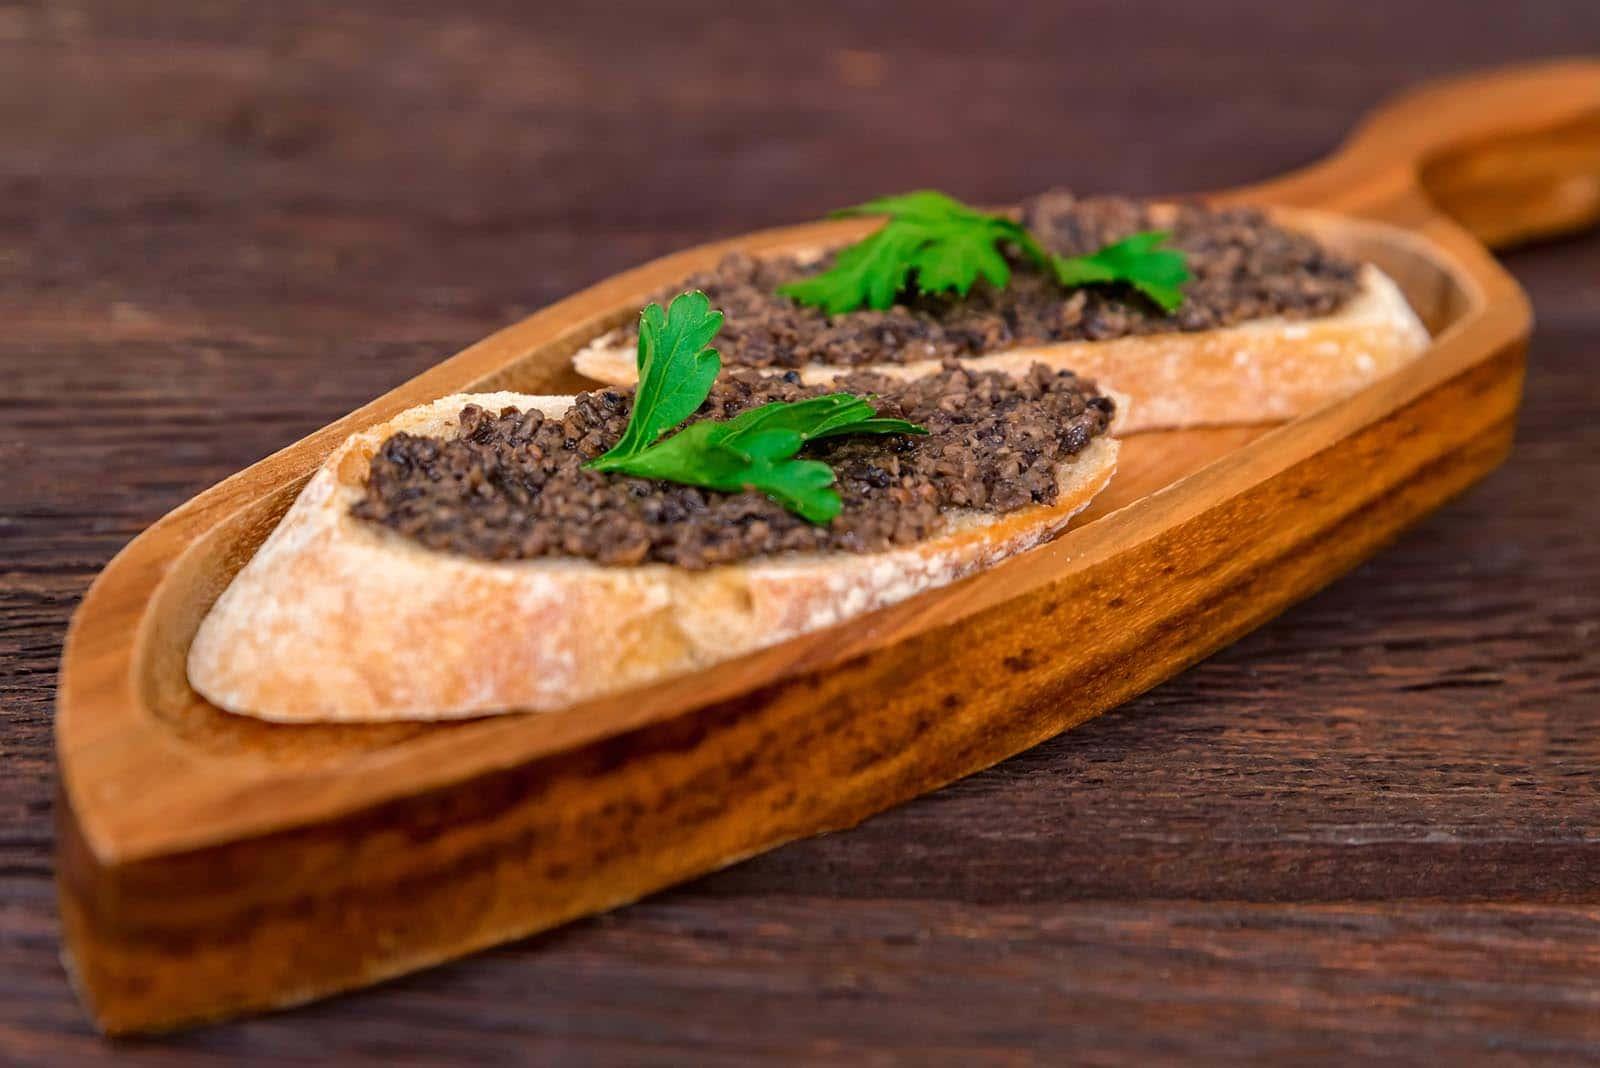 crema di tartufo su pane